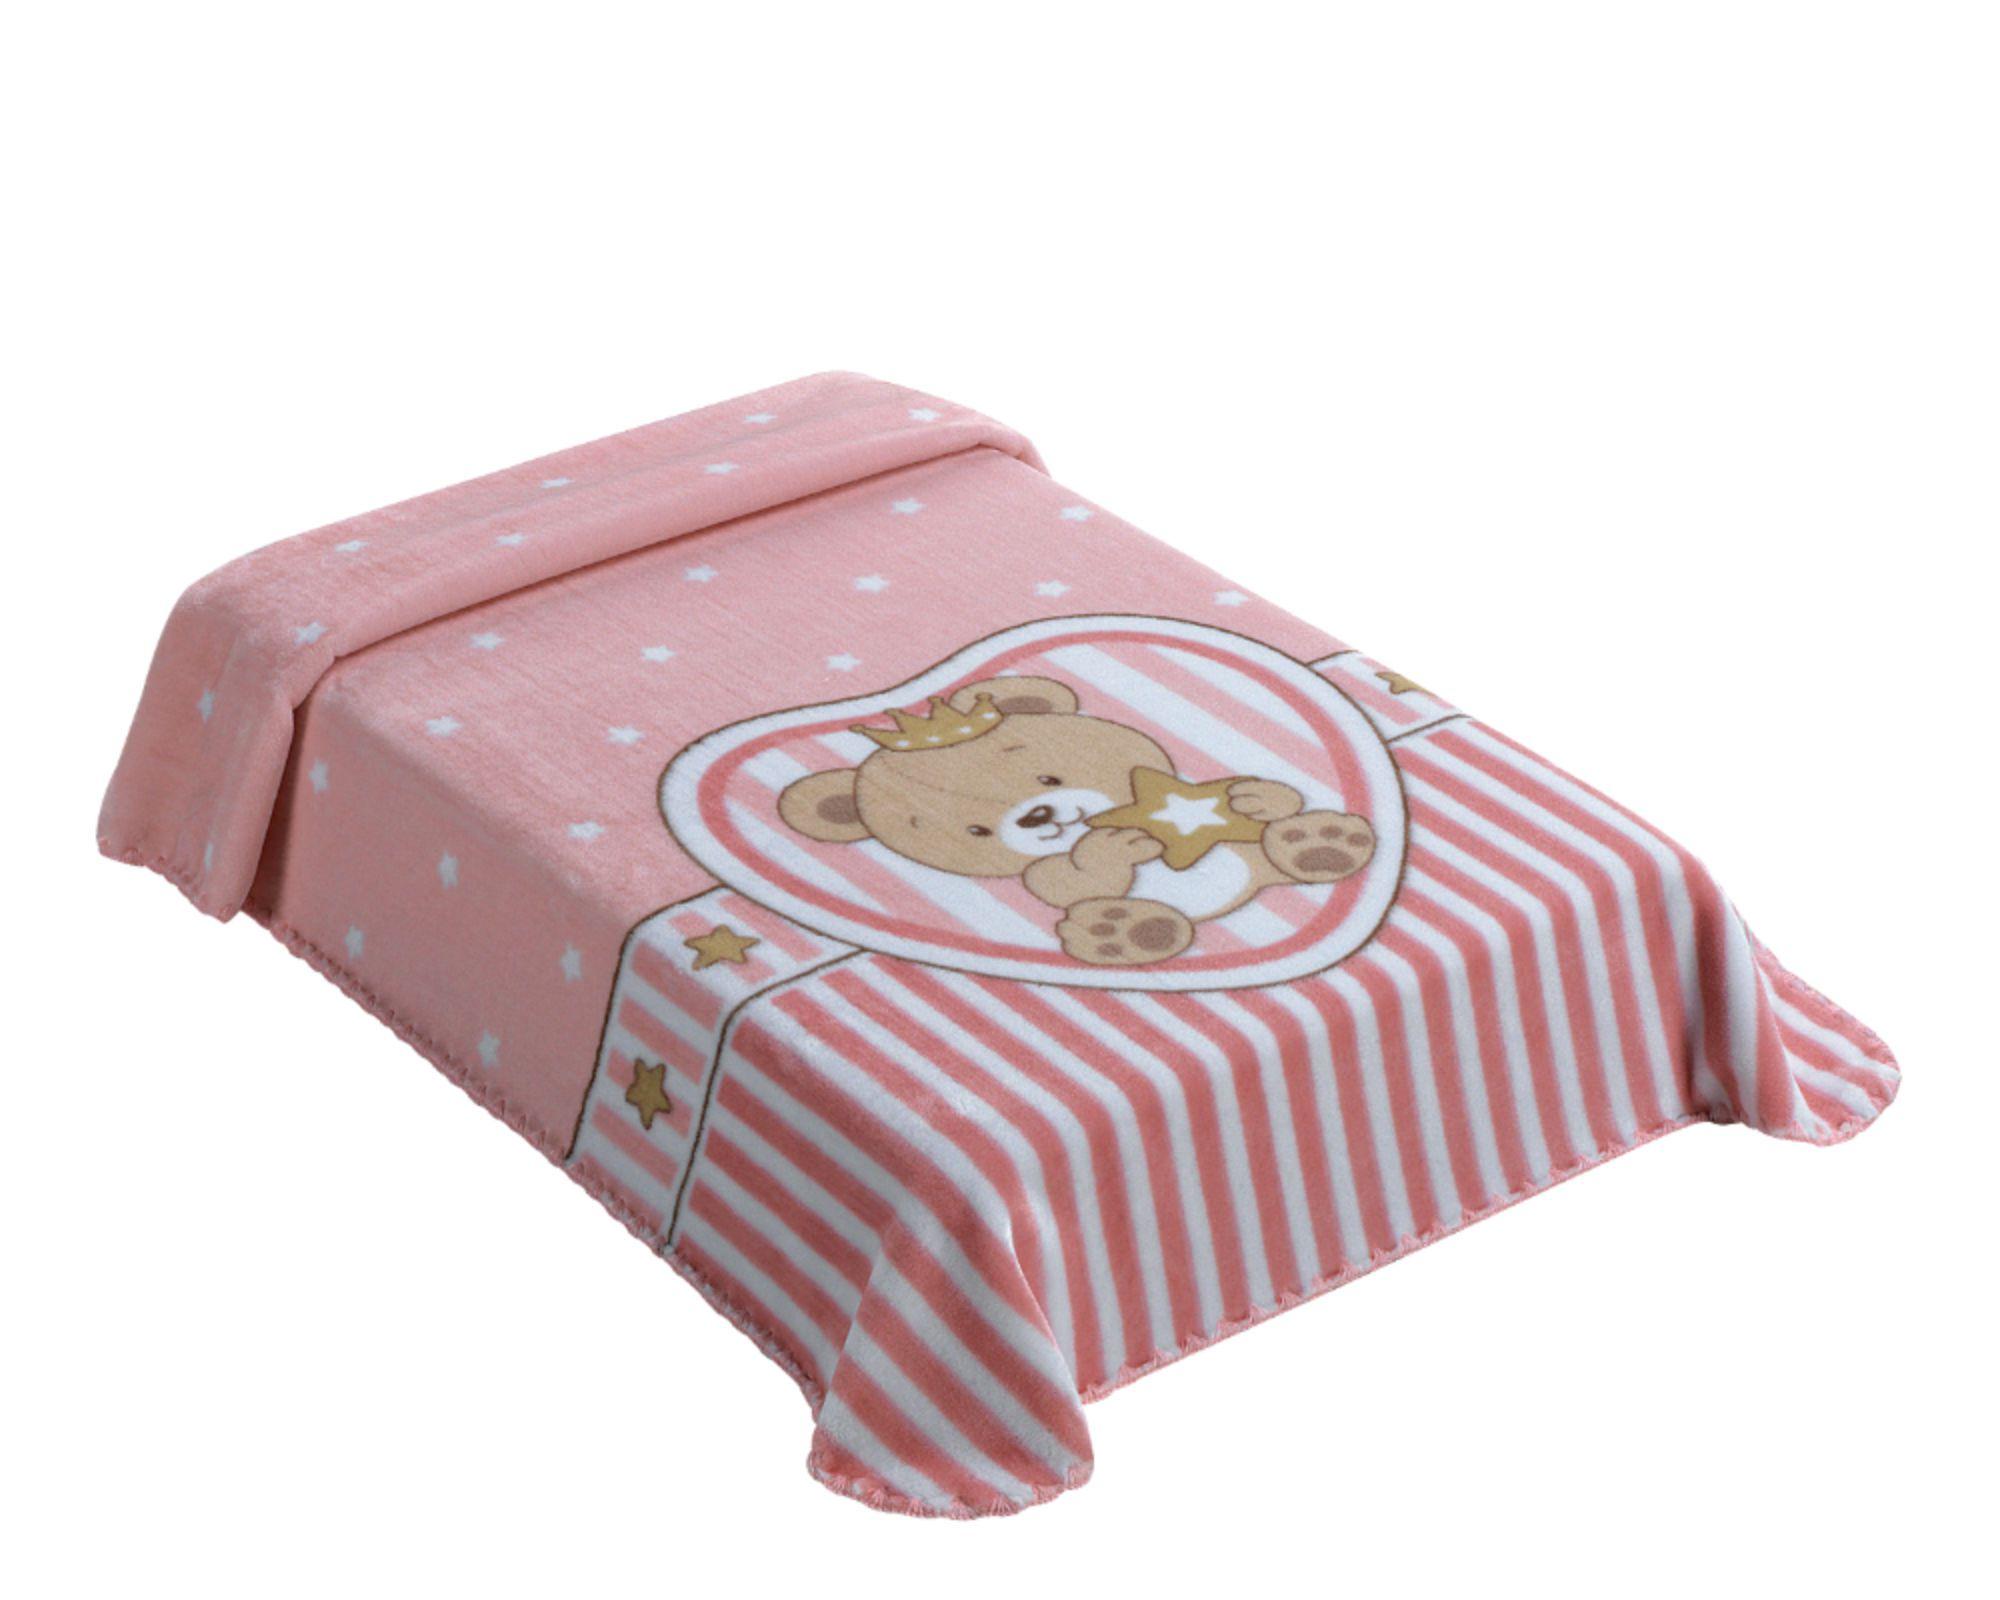 Cobertor Le Petit King Size Superstar Rosa